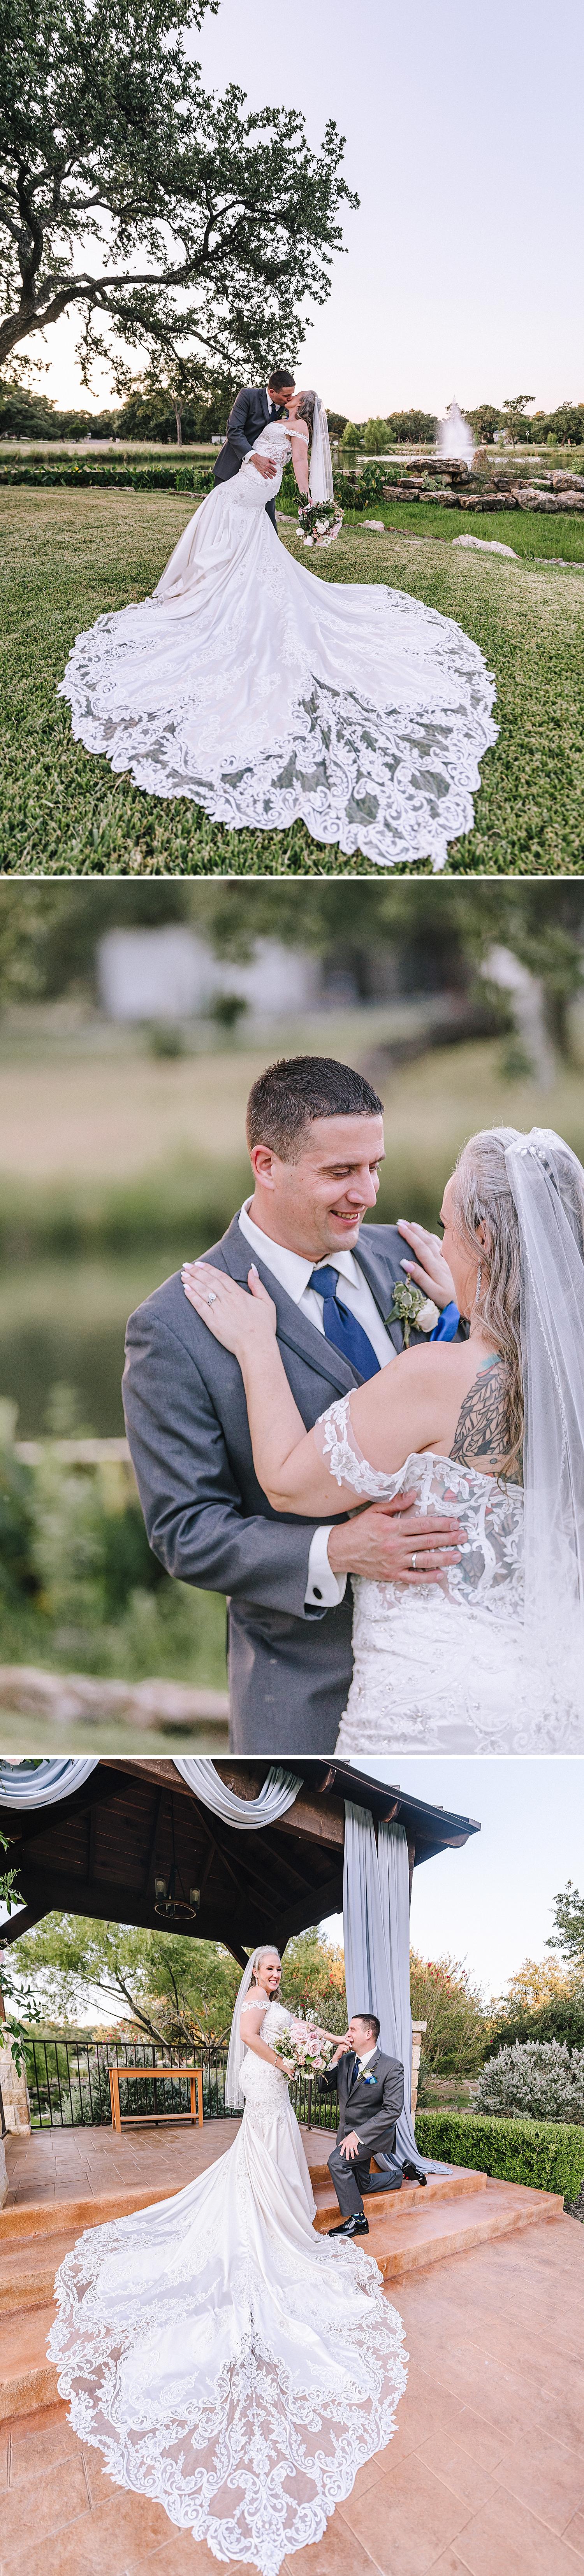 The-Club-at-Garden-Ridge-Military-Wedding-Carly-Barton-Photography_0054.jpg